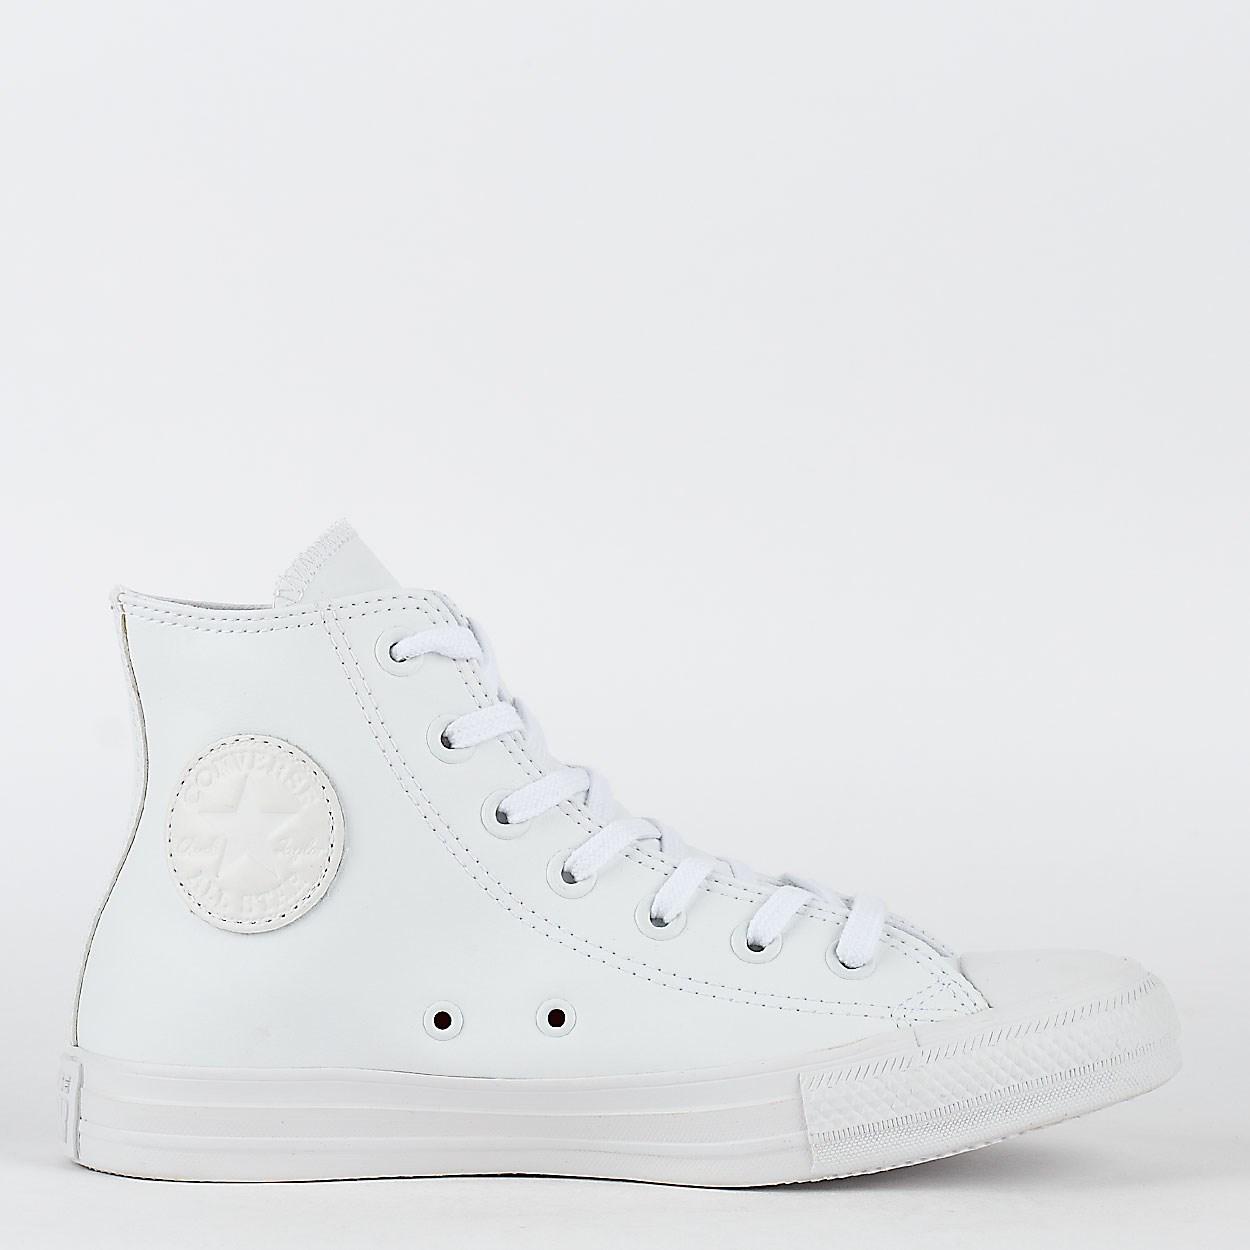 f4c14f16d20 ... cheap tênis converse chuck taylor all star monochrome leather hi branco  branco ct08250001 78050 f5052